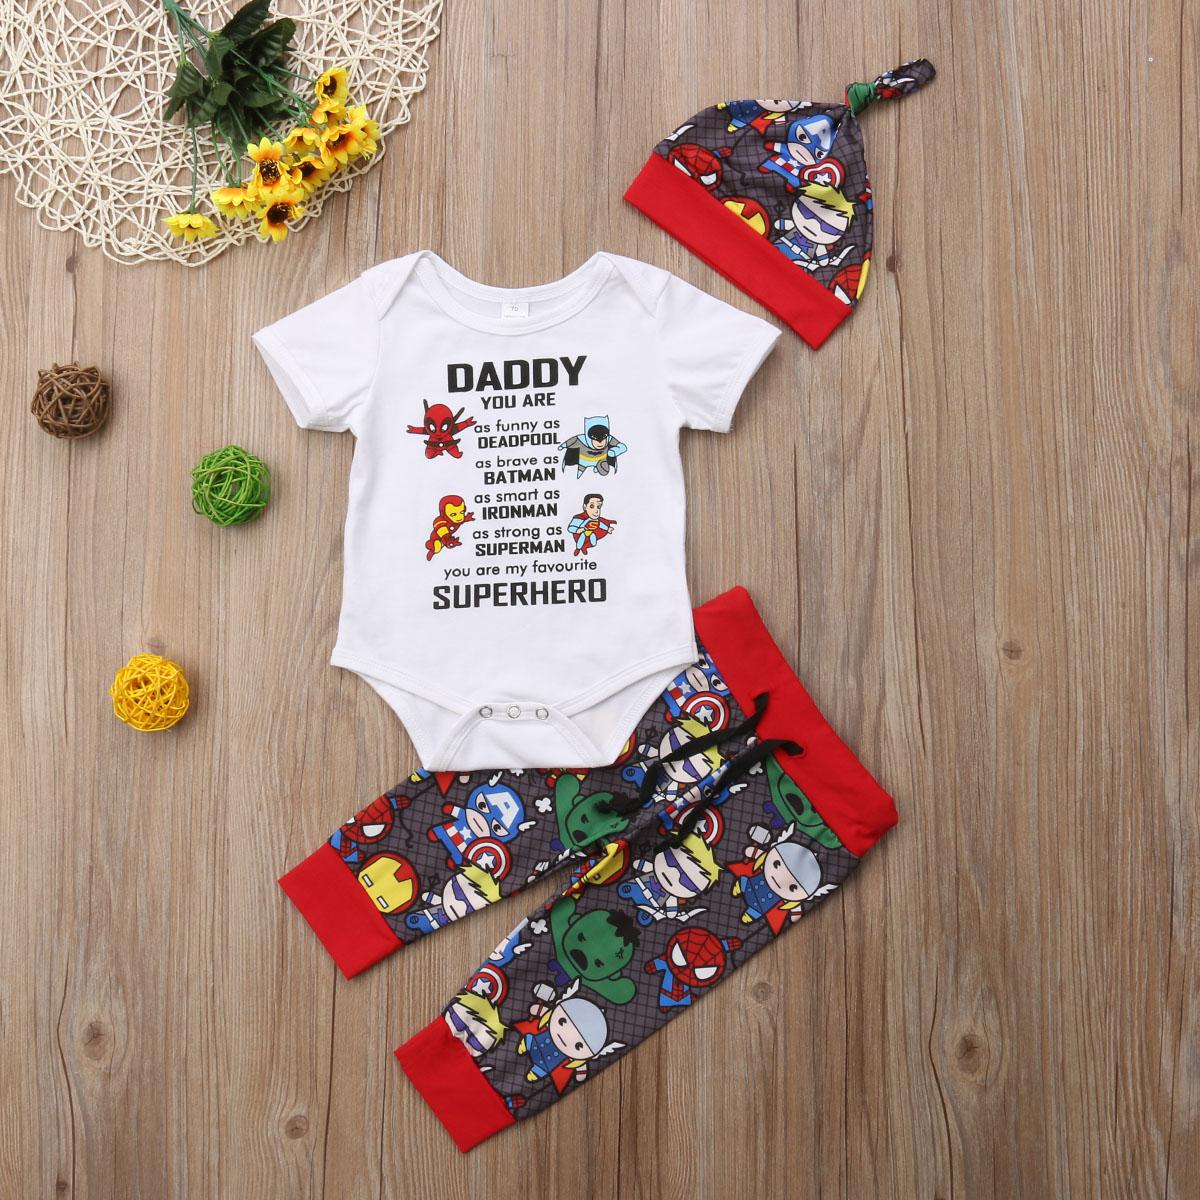 USA Newborn Baby Boys Girls Avengers Superhero Bodysuit Sets Pants Outfits Set Clothes